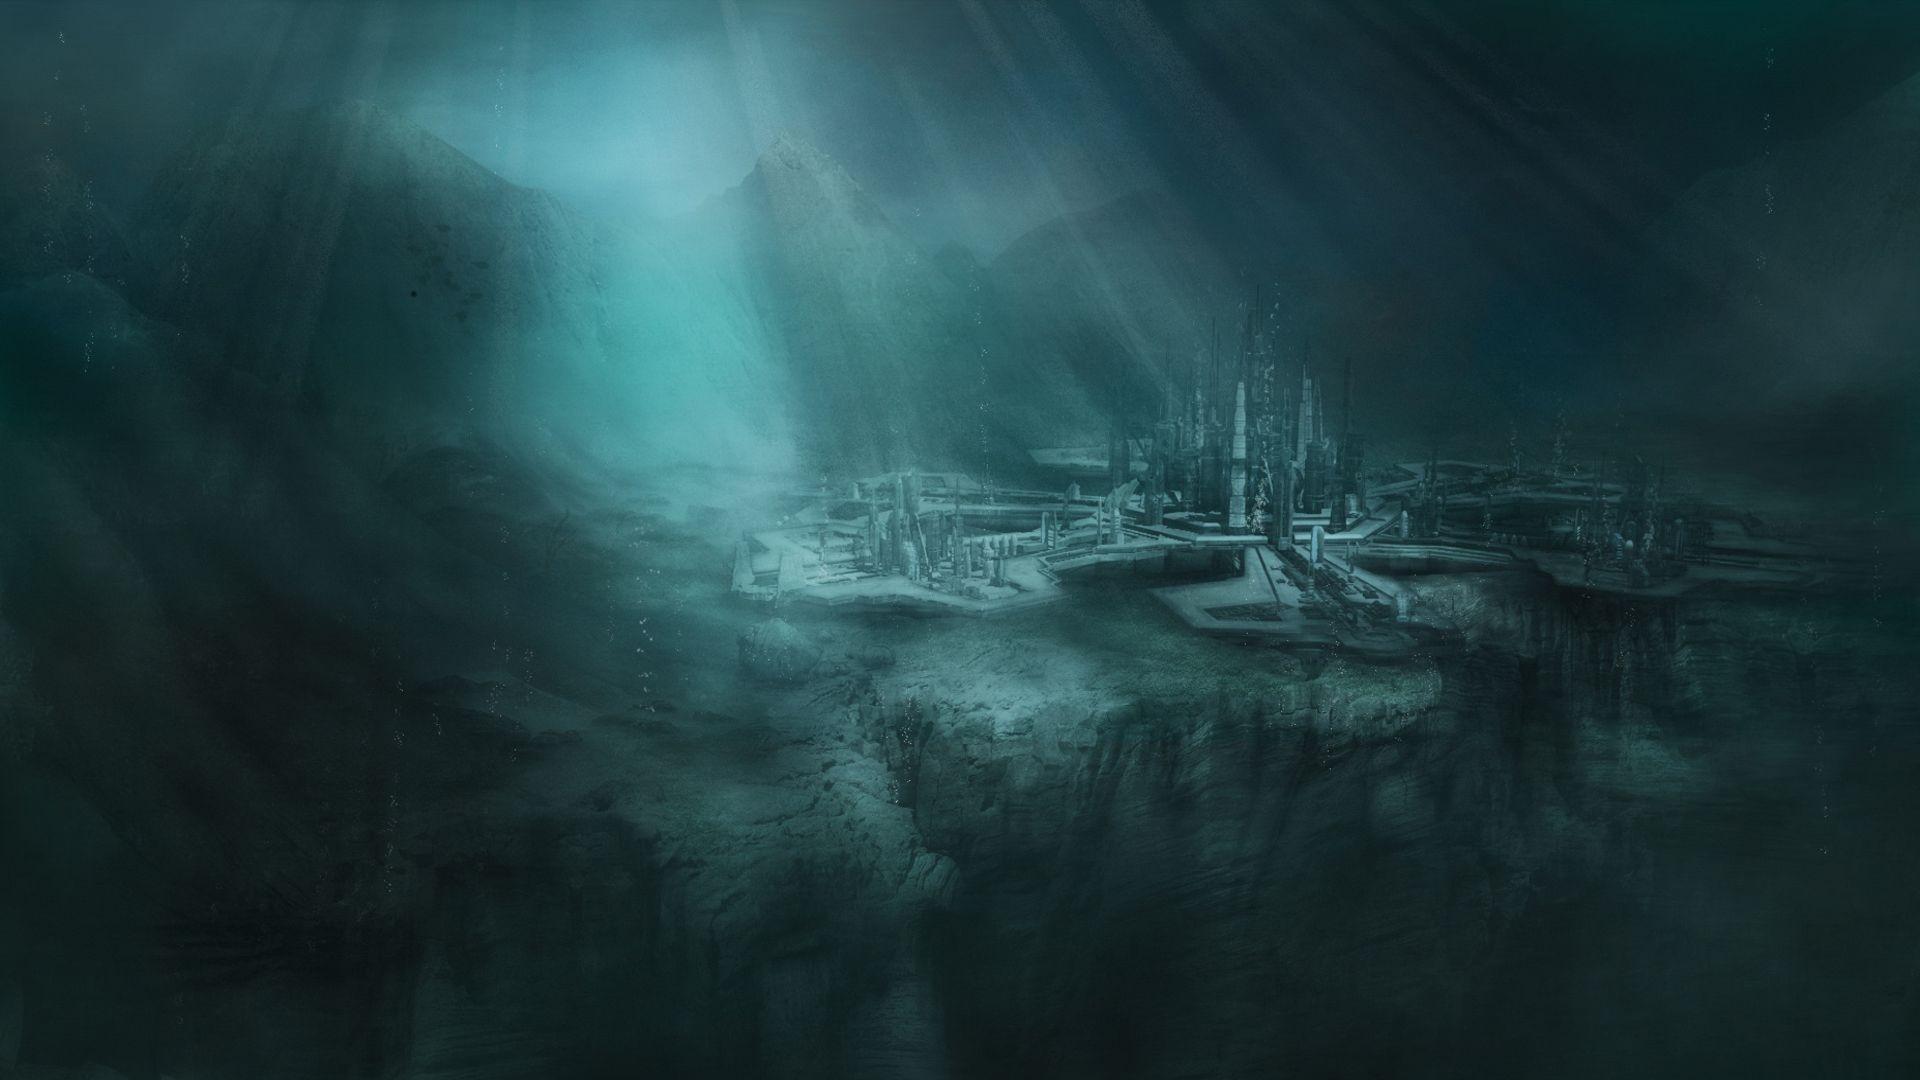 Stargate Atlantis Hd Wallpaper Background Image